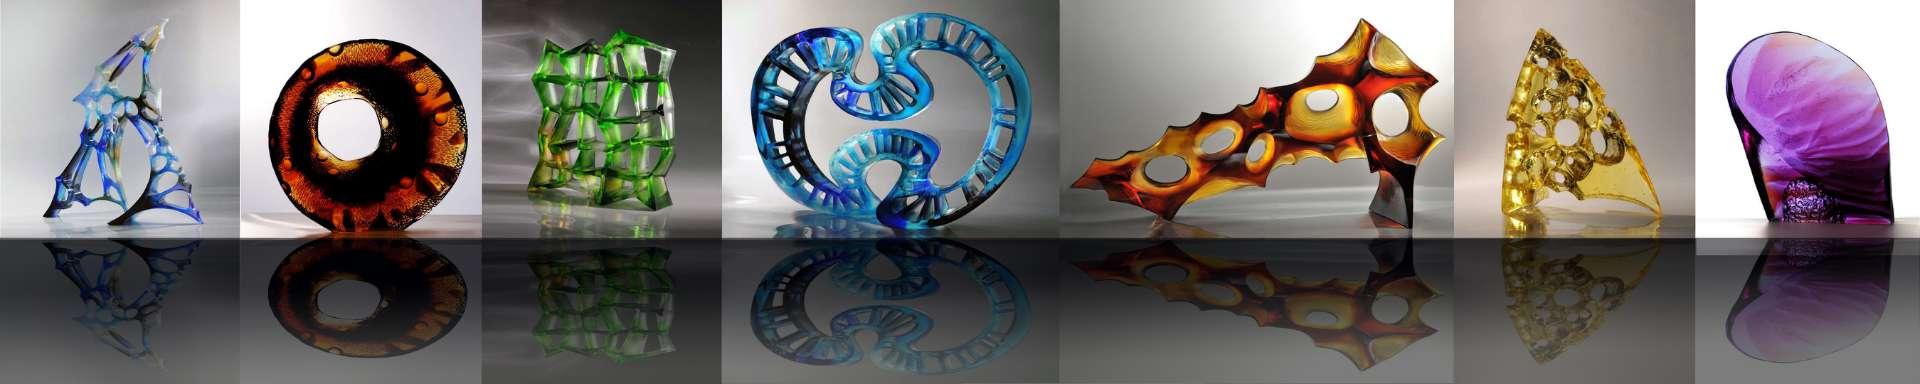 lu-chi_glass-sculptures_gallery_slide111_1920x384